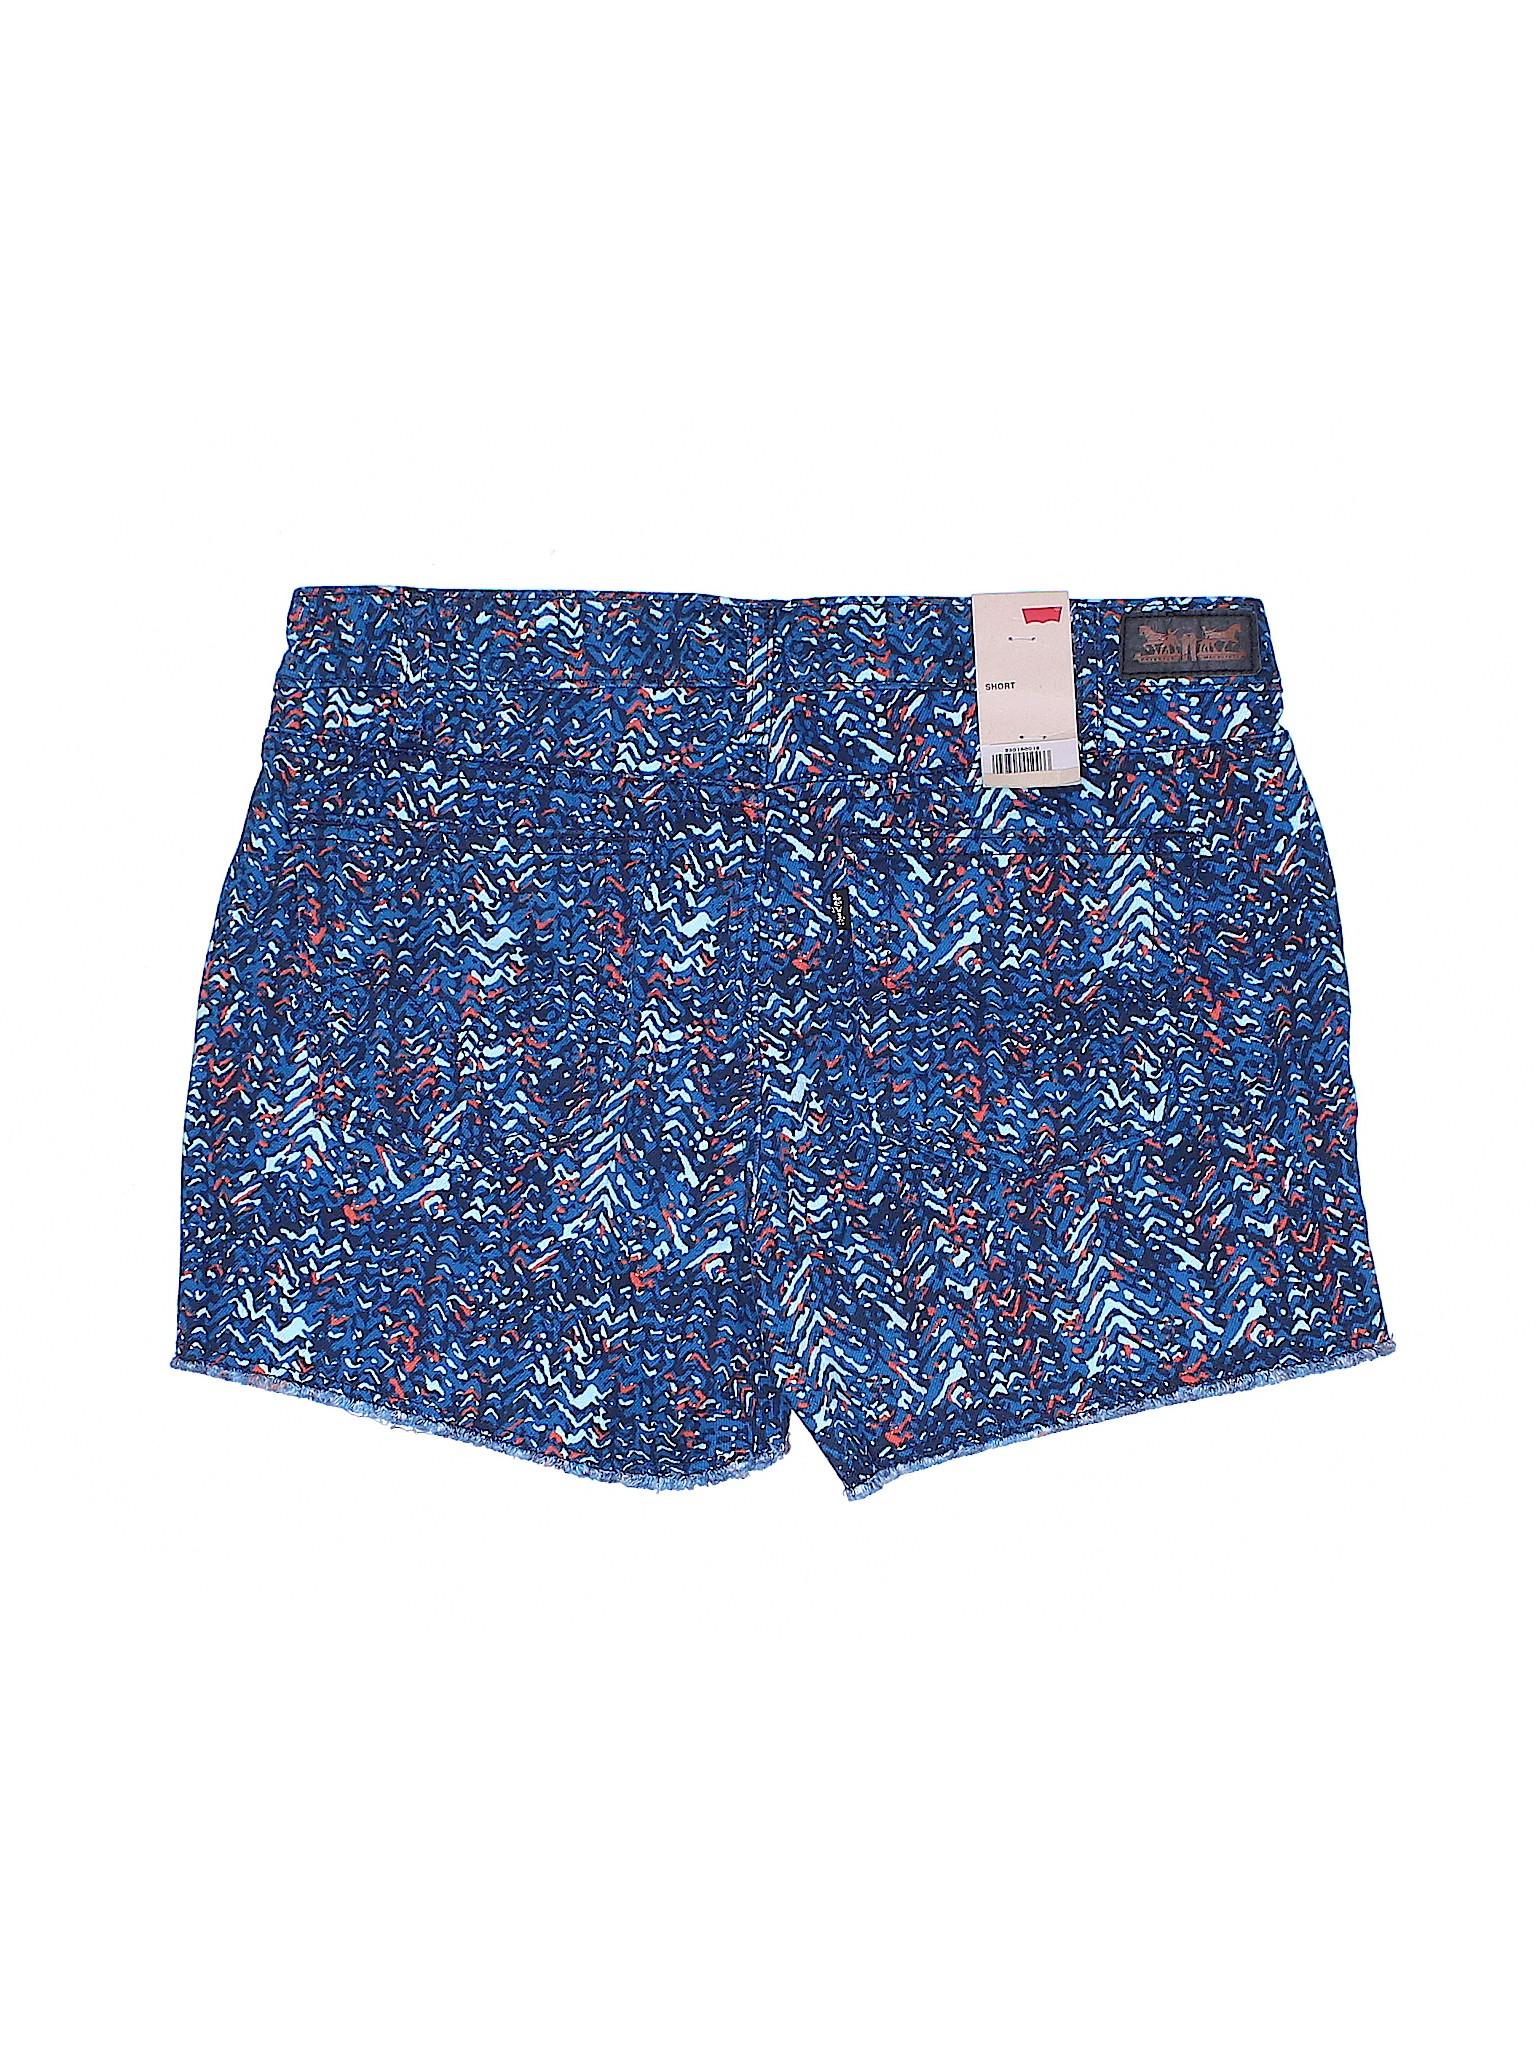 Levi's Leisure Denim Leisure winter winter Levi's Denim Shorts Shorts Leisure aZaC0